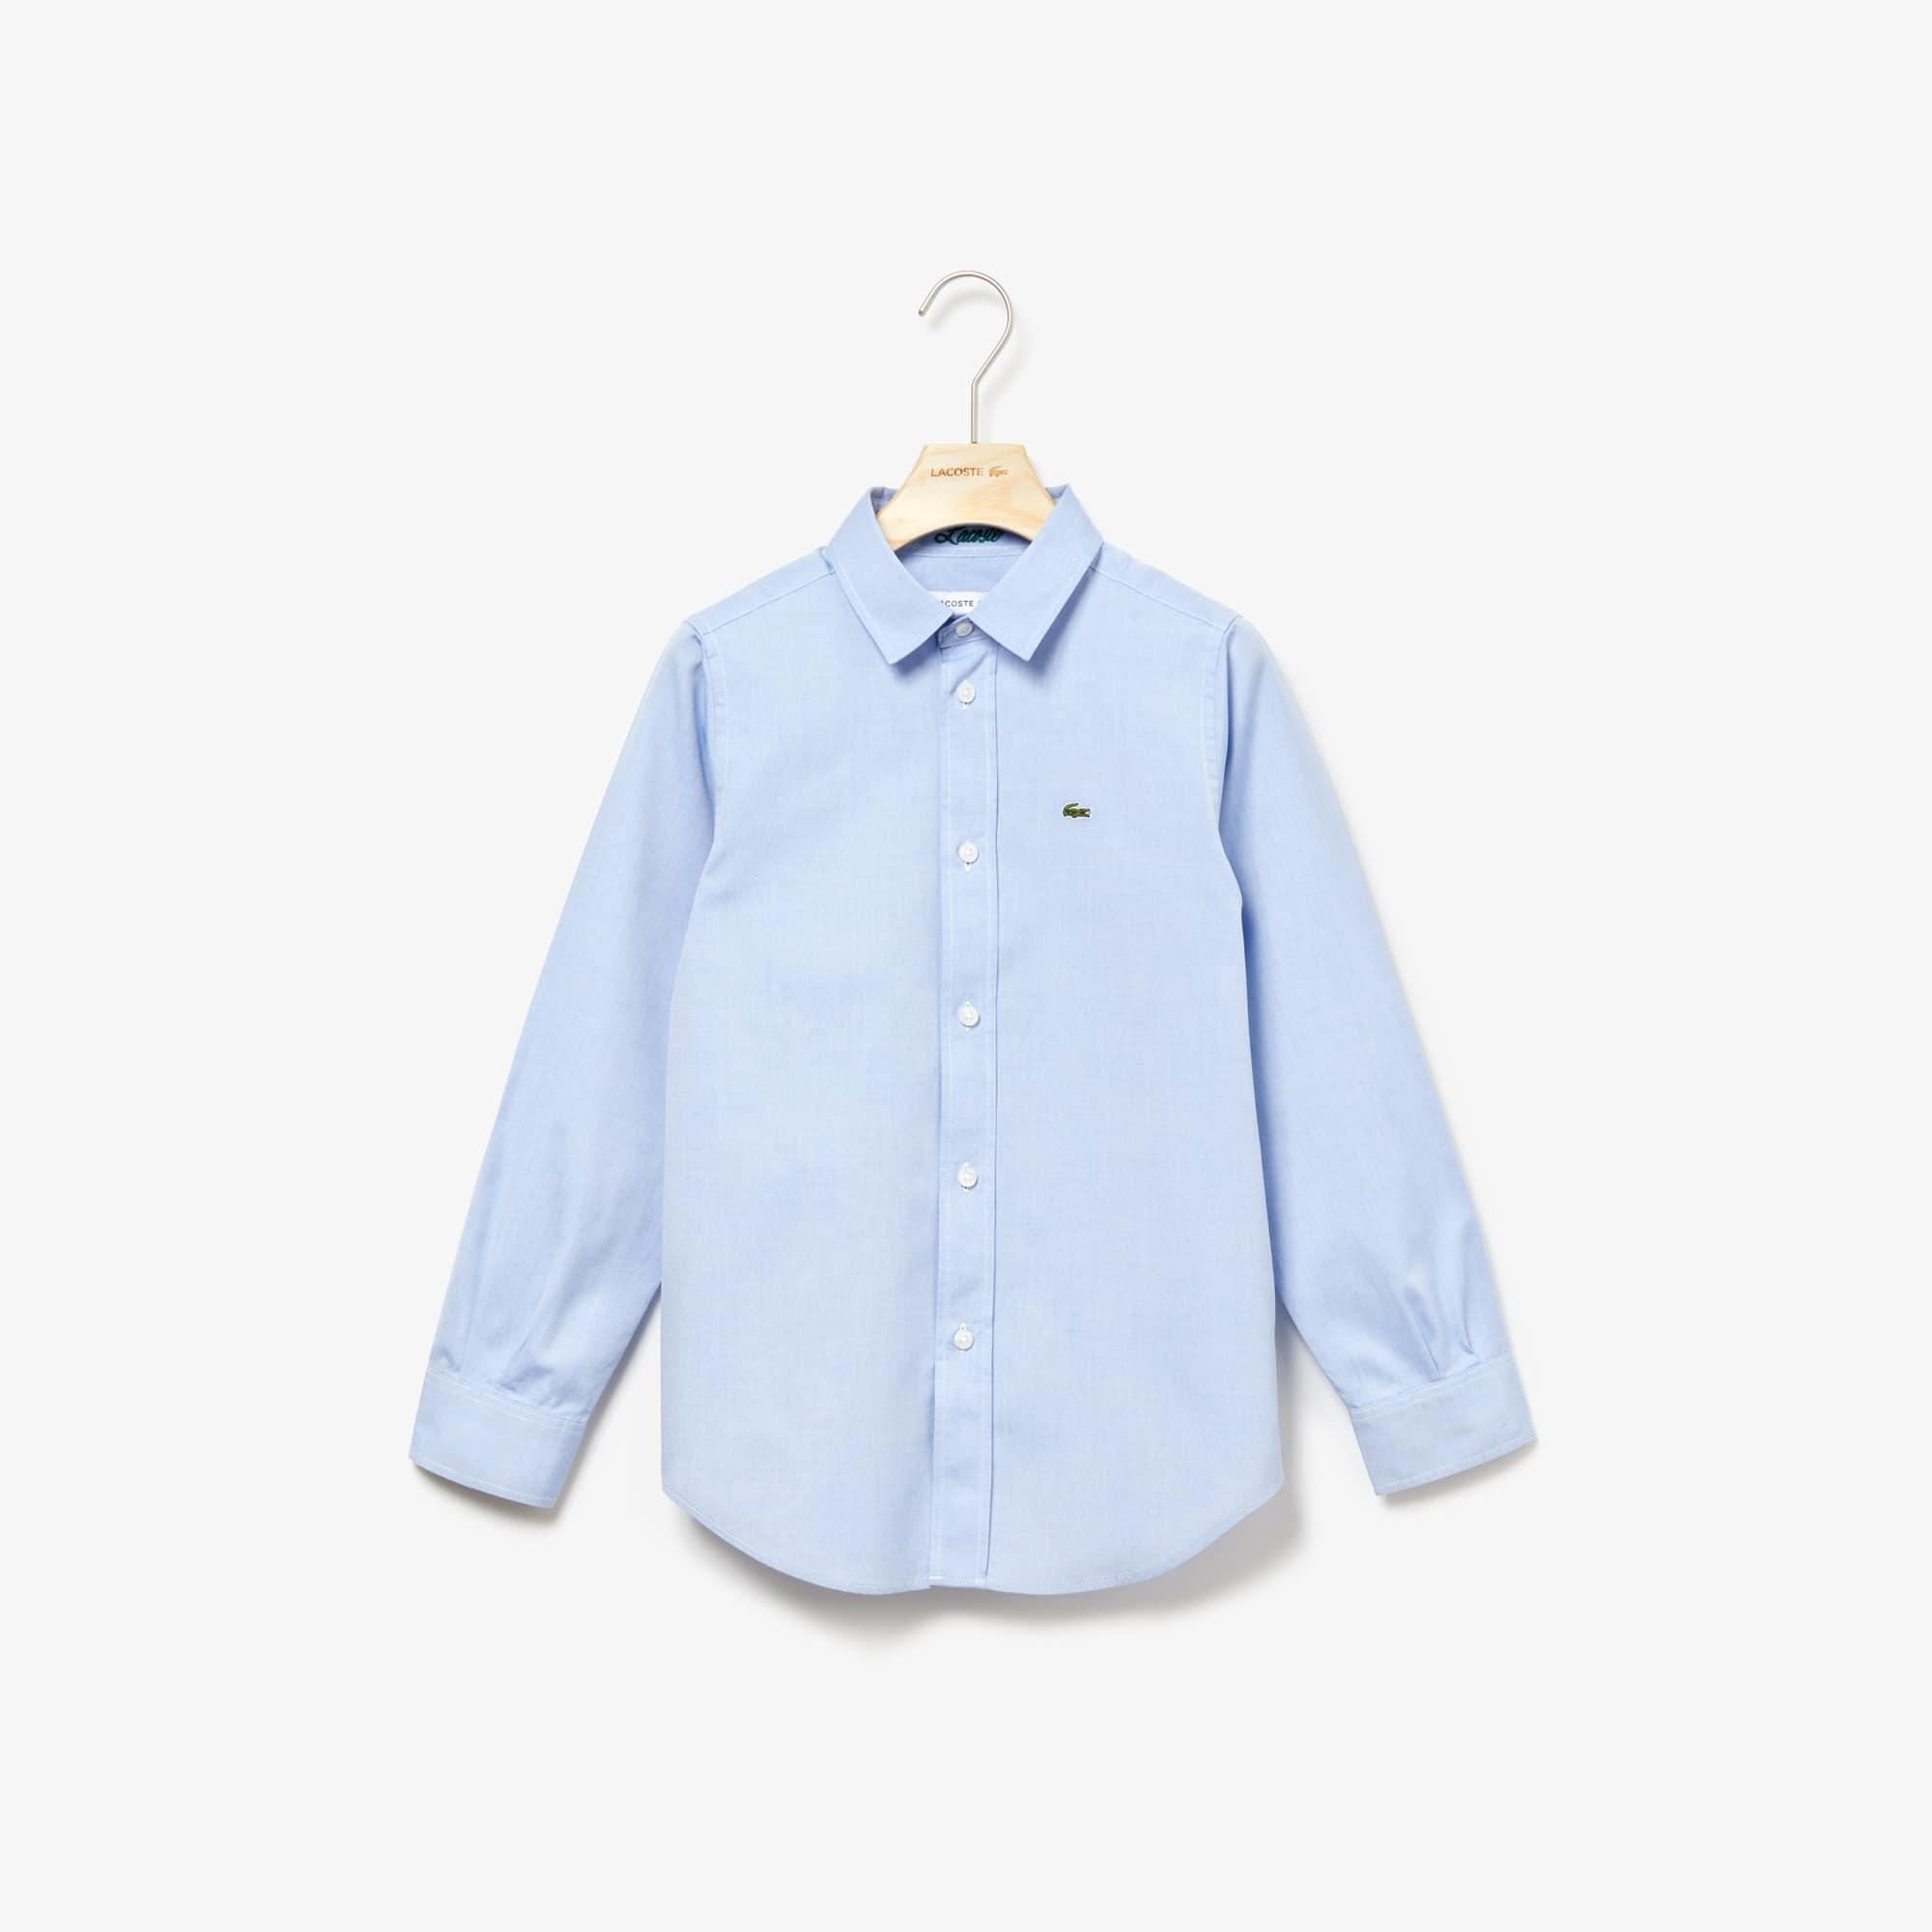 Camicia da bambino in cotone Oxford tinta unita